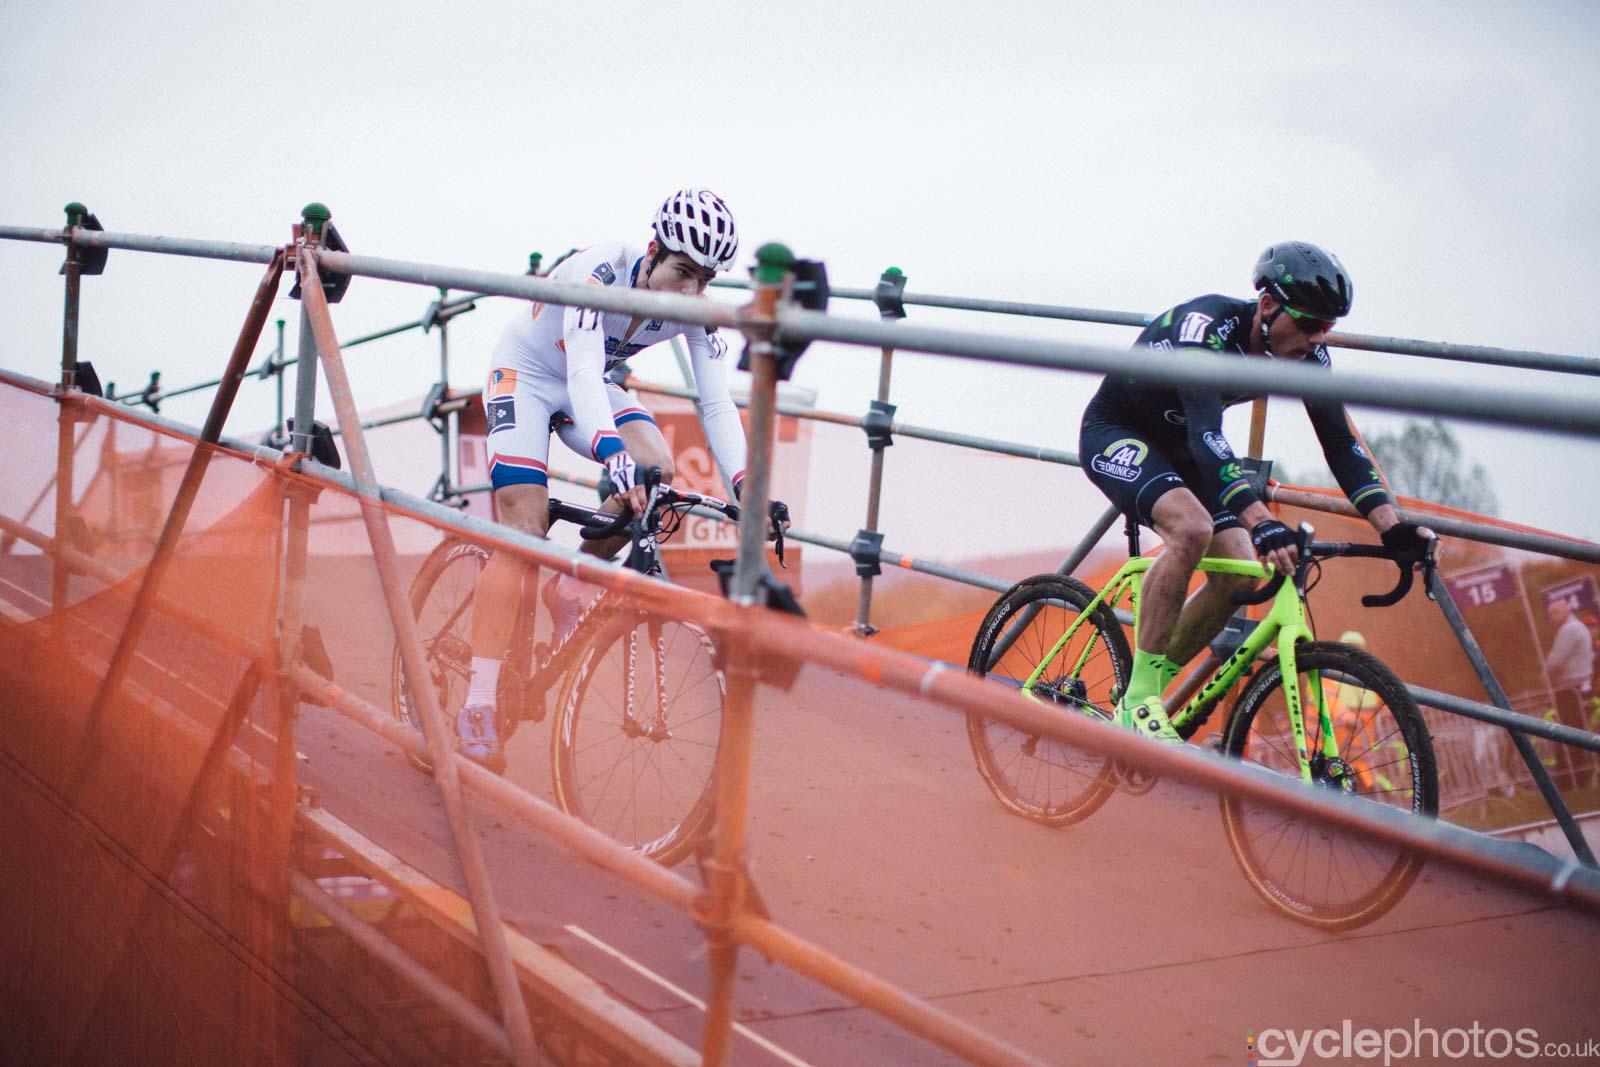 2015-cyclephotos-cyclocross-valkenburg-155725-sven-nys-wout-van-aert